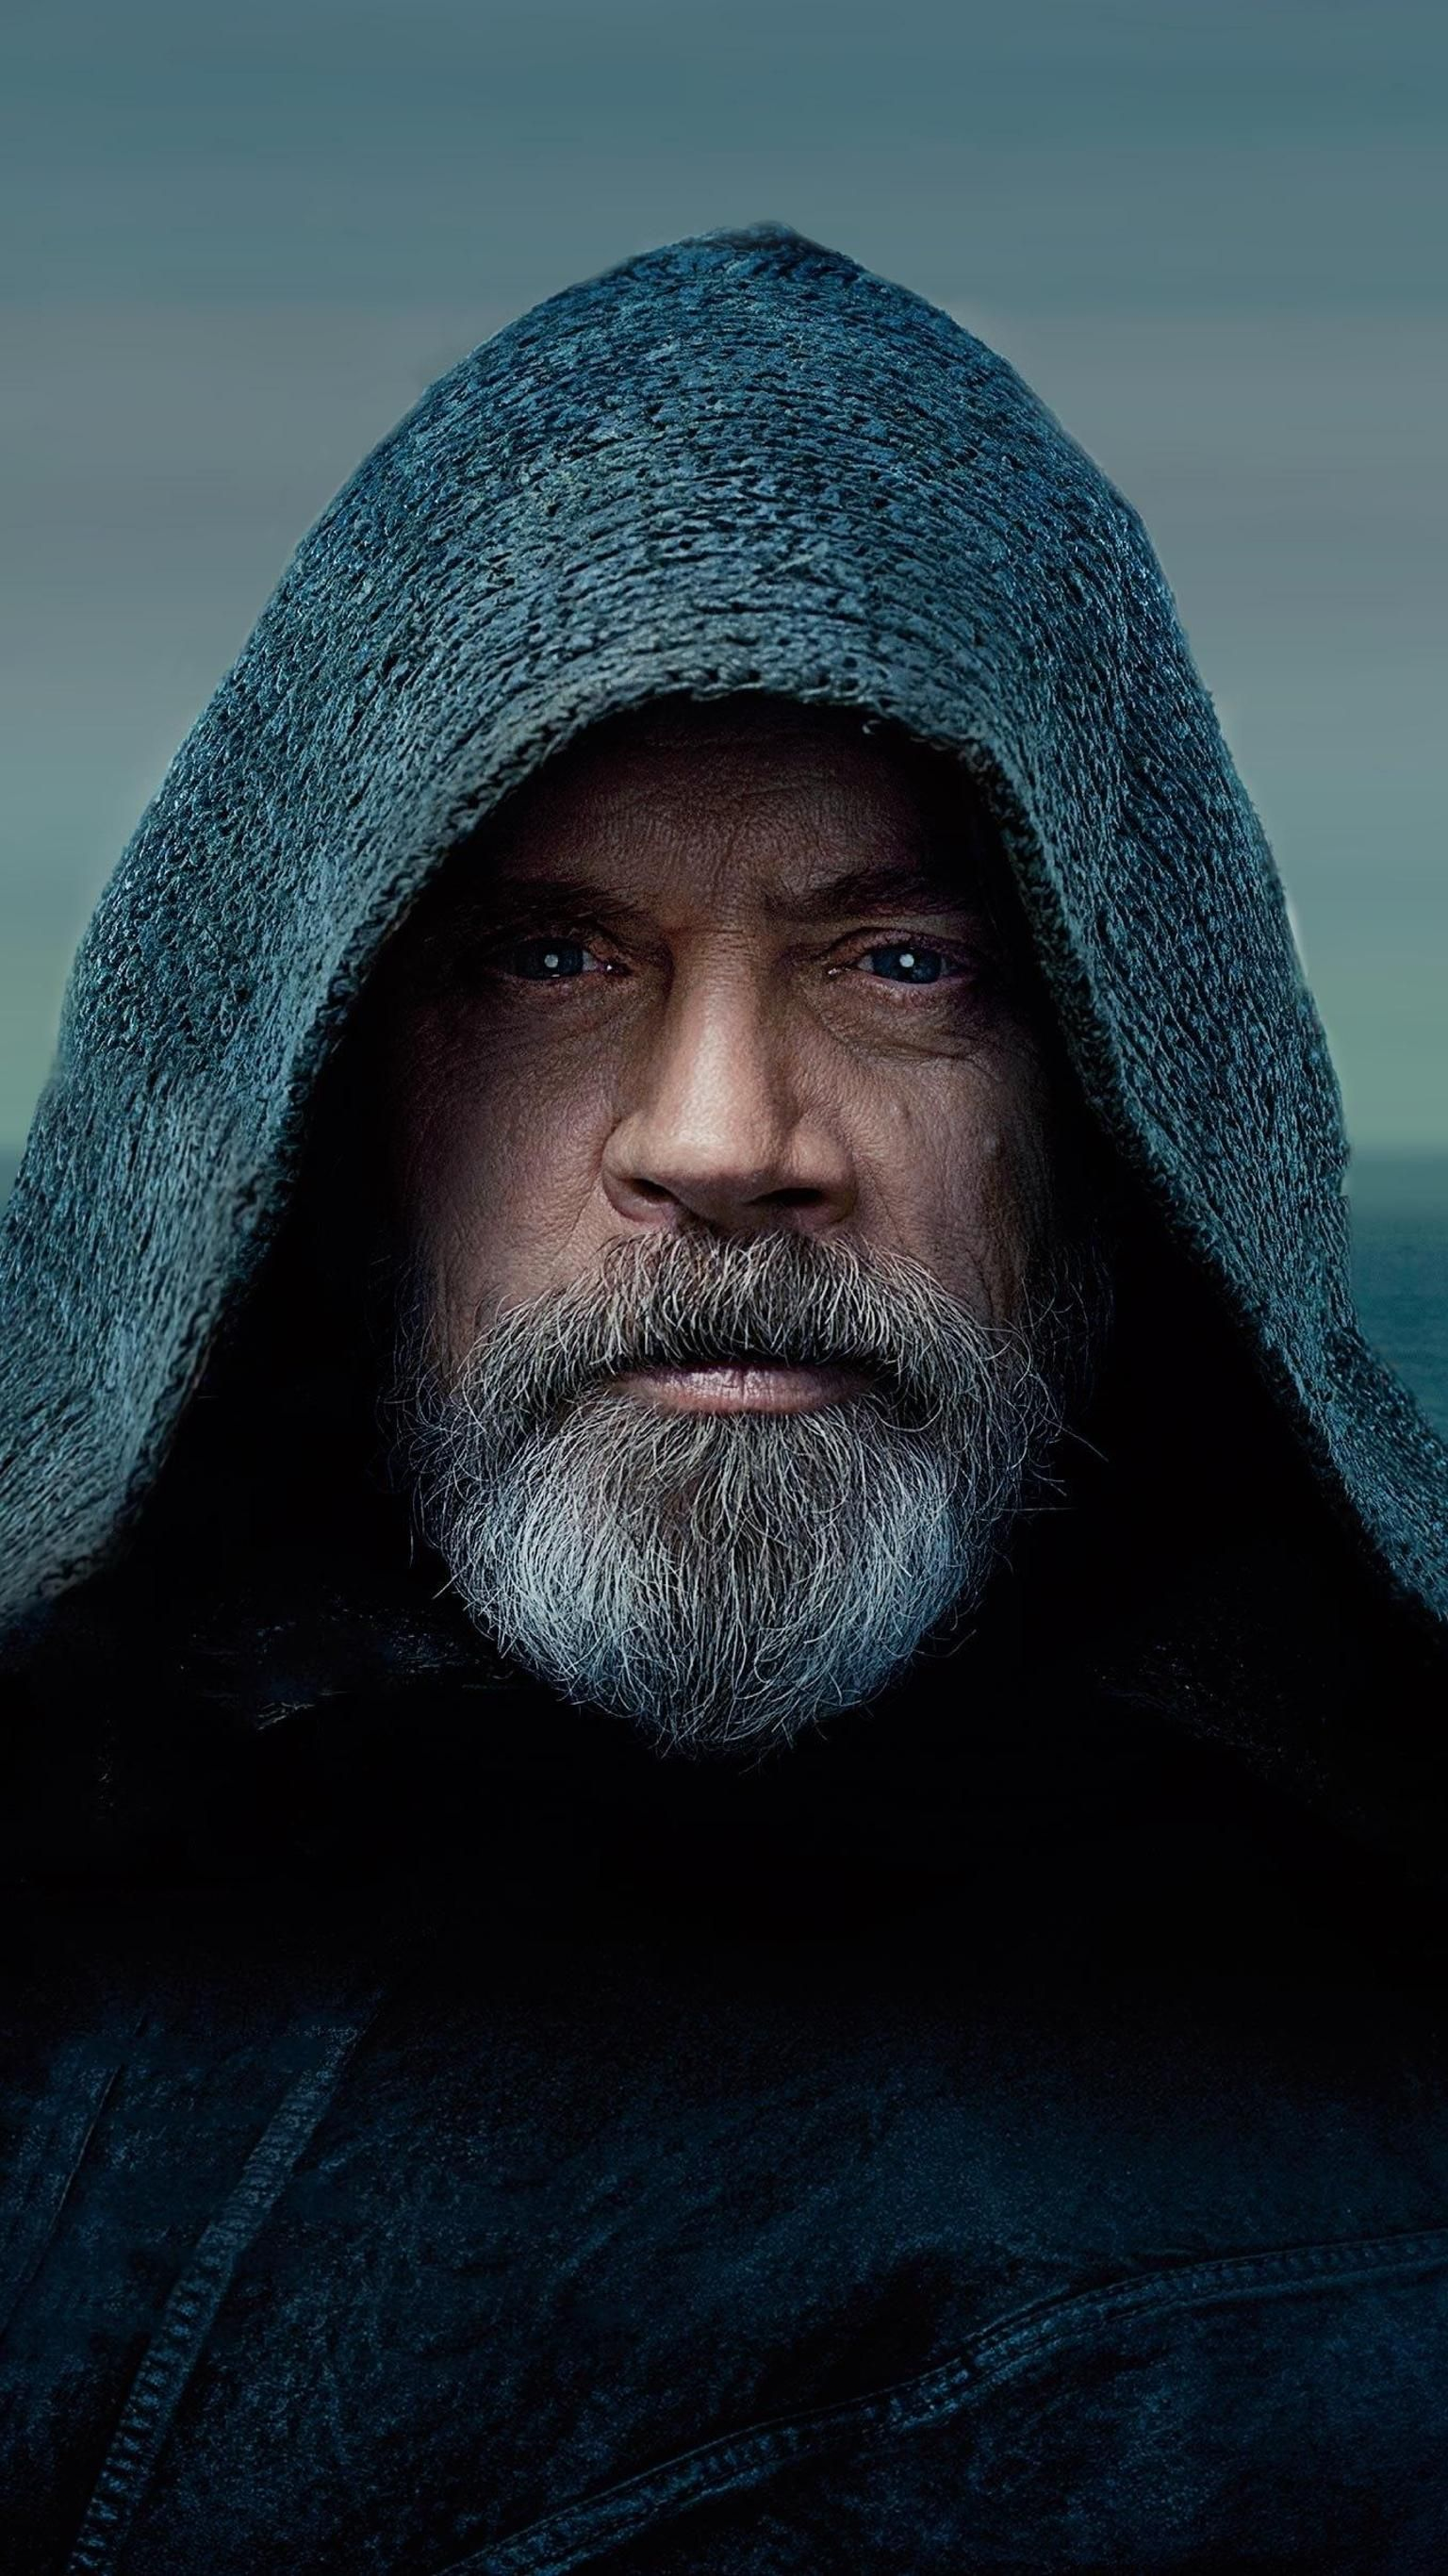 Star Wars The Last Jedi 2017 Phone Wallpaper Moviemania Star Wars Models Star Wars Wallpaper Star Wars Luke